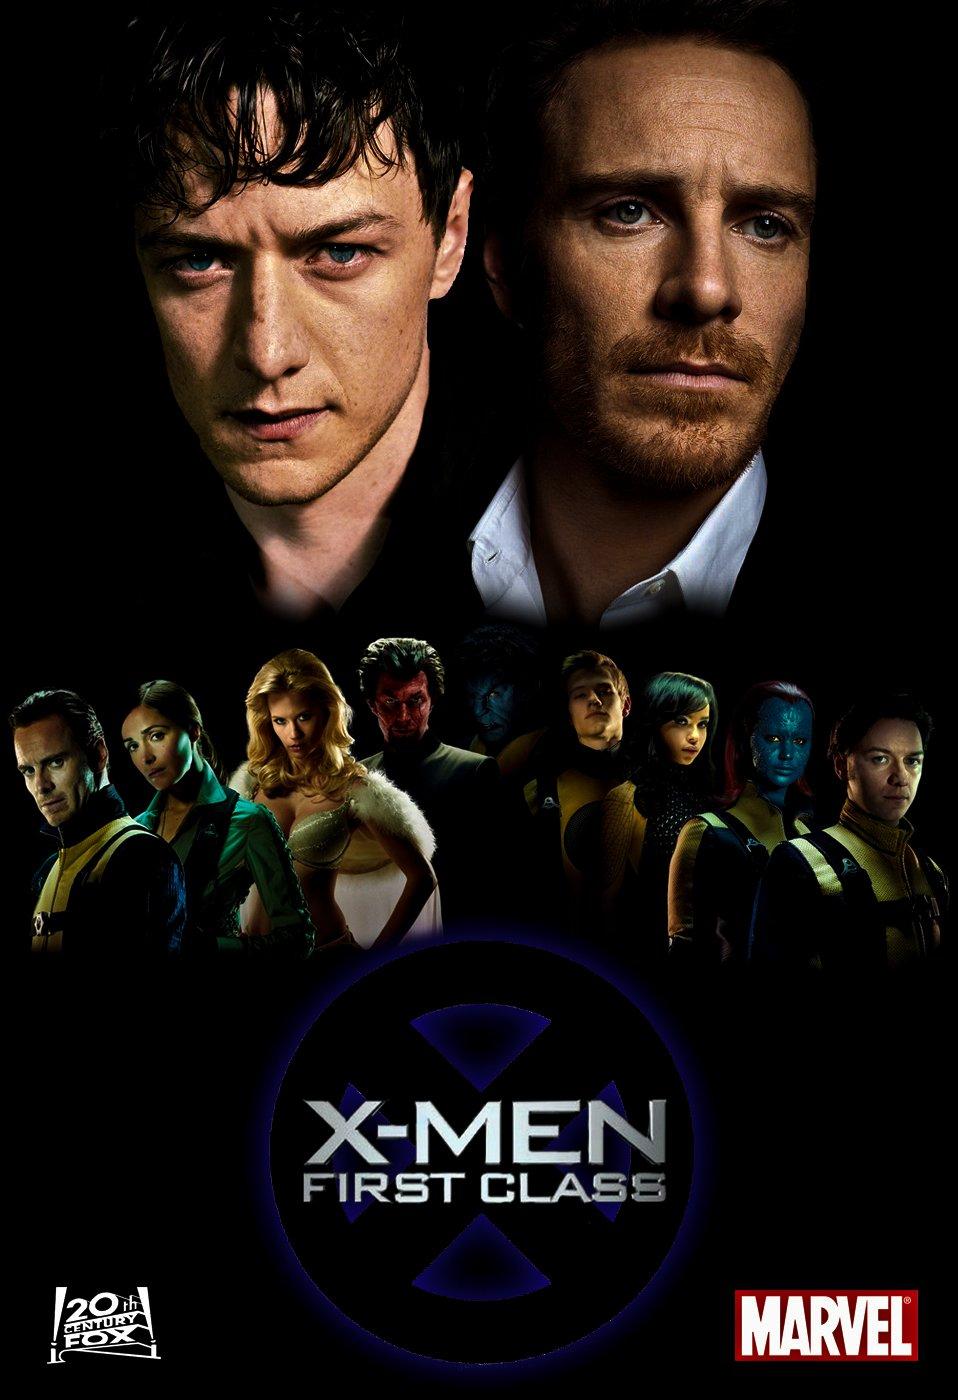 SciFiComicGuy: X-Men